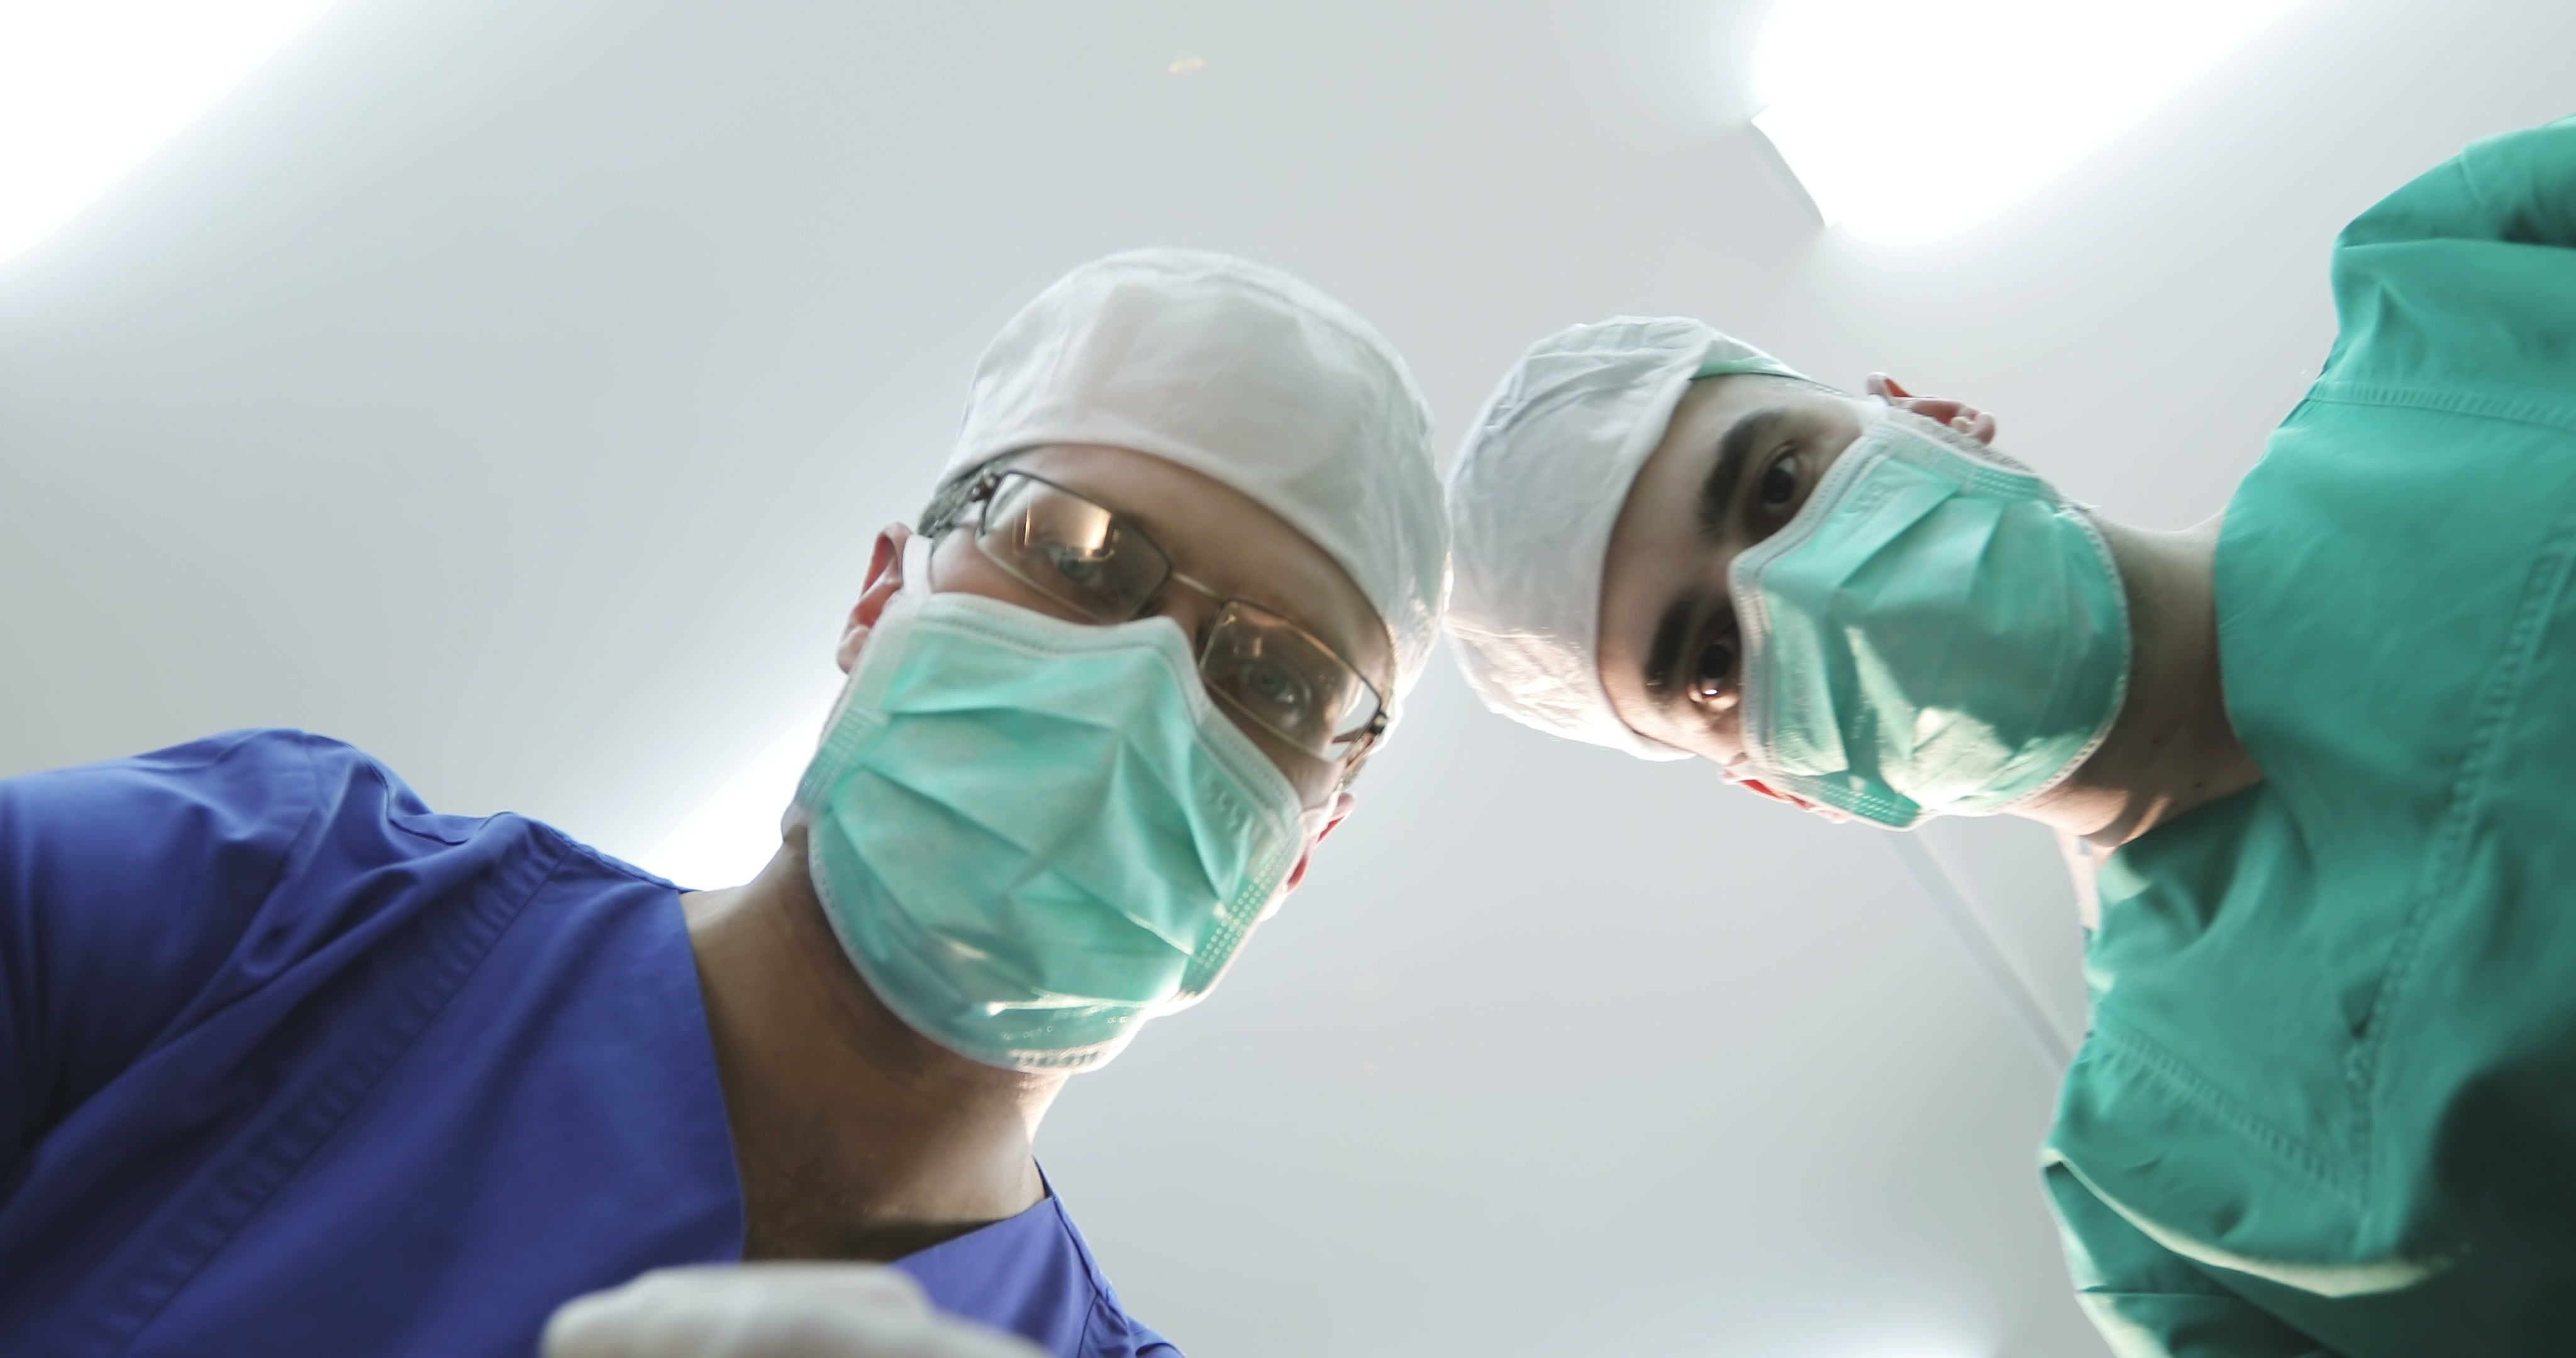 Images Of Doctors In Scrubs